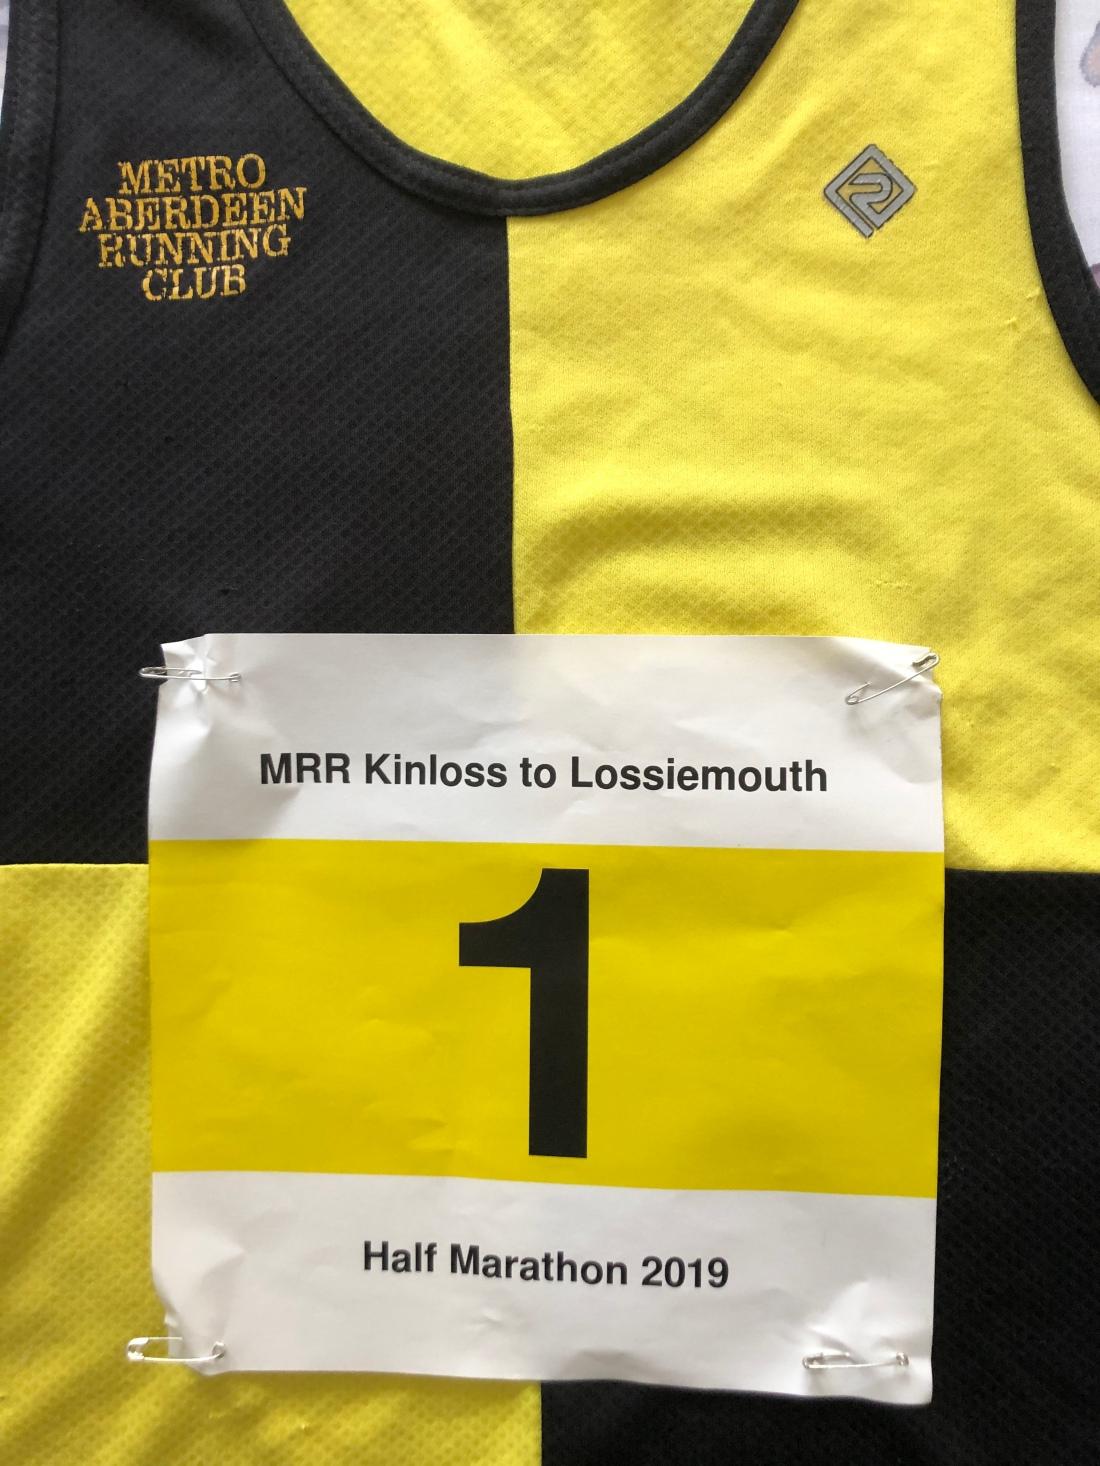 Number 1: Metro Aberdeen do Kinloss to Lossiemouth Half Marathon